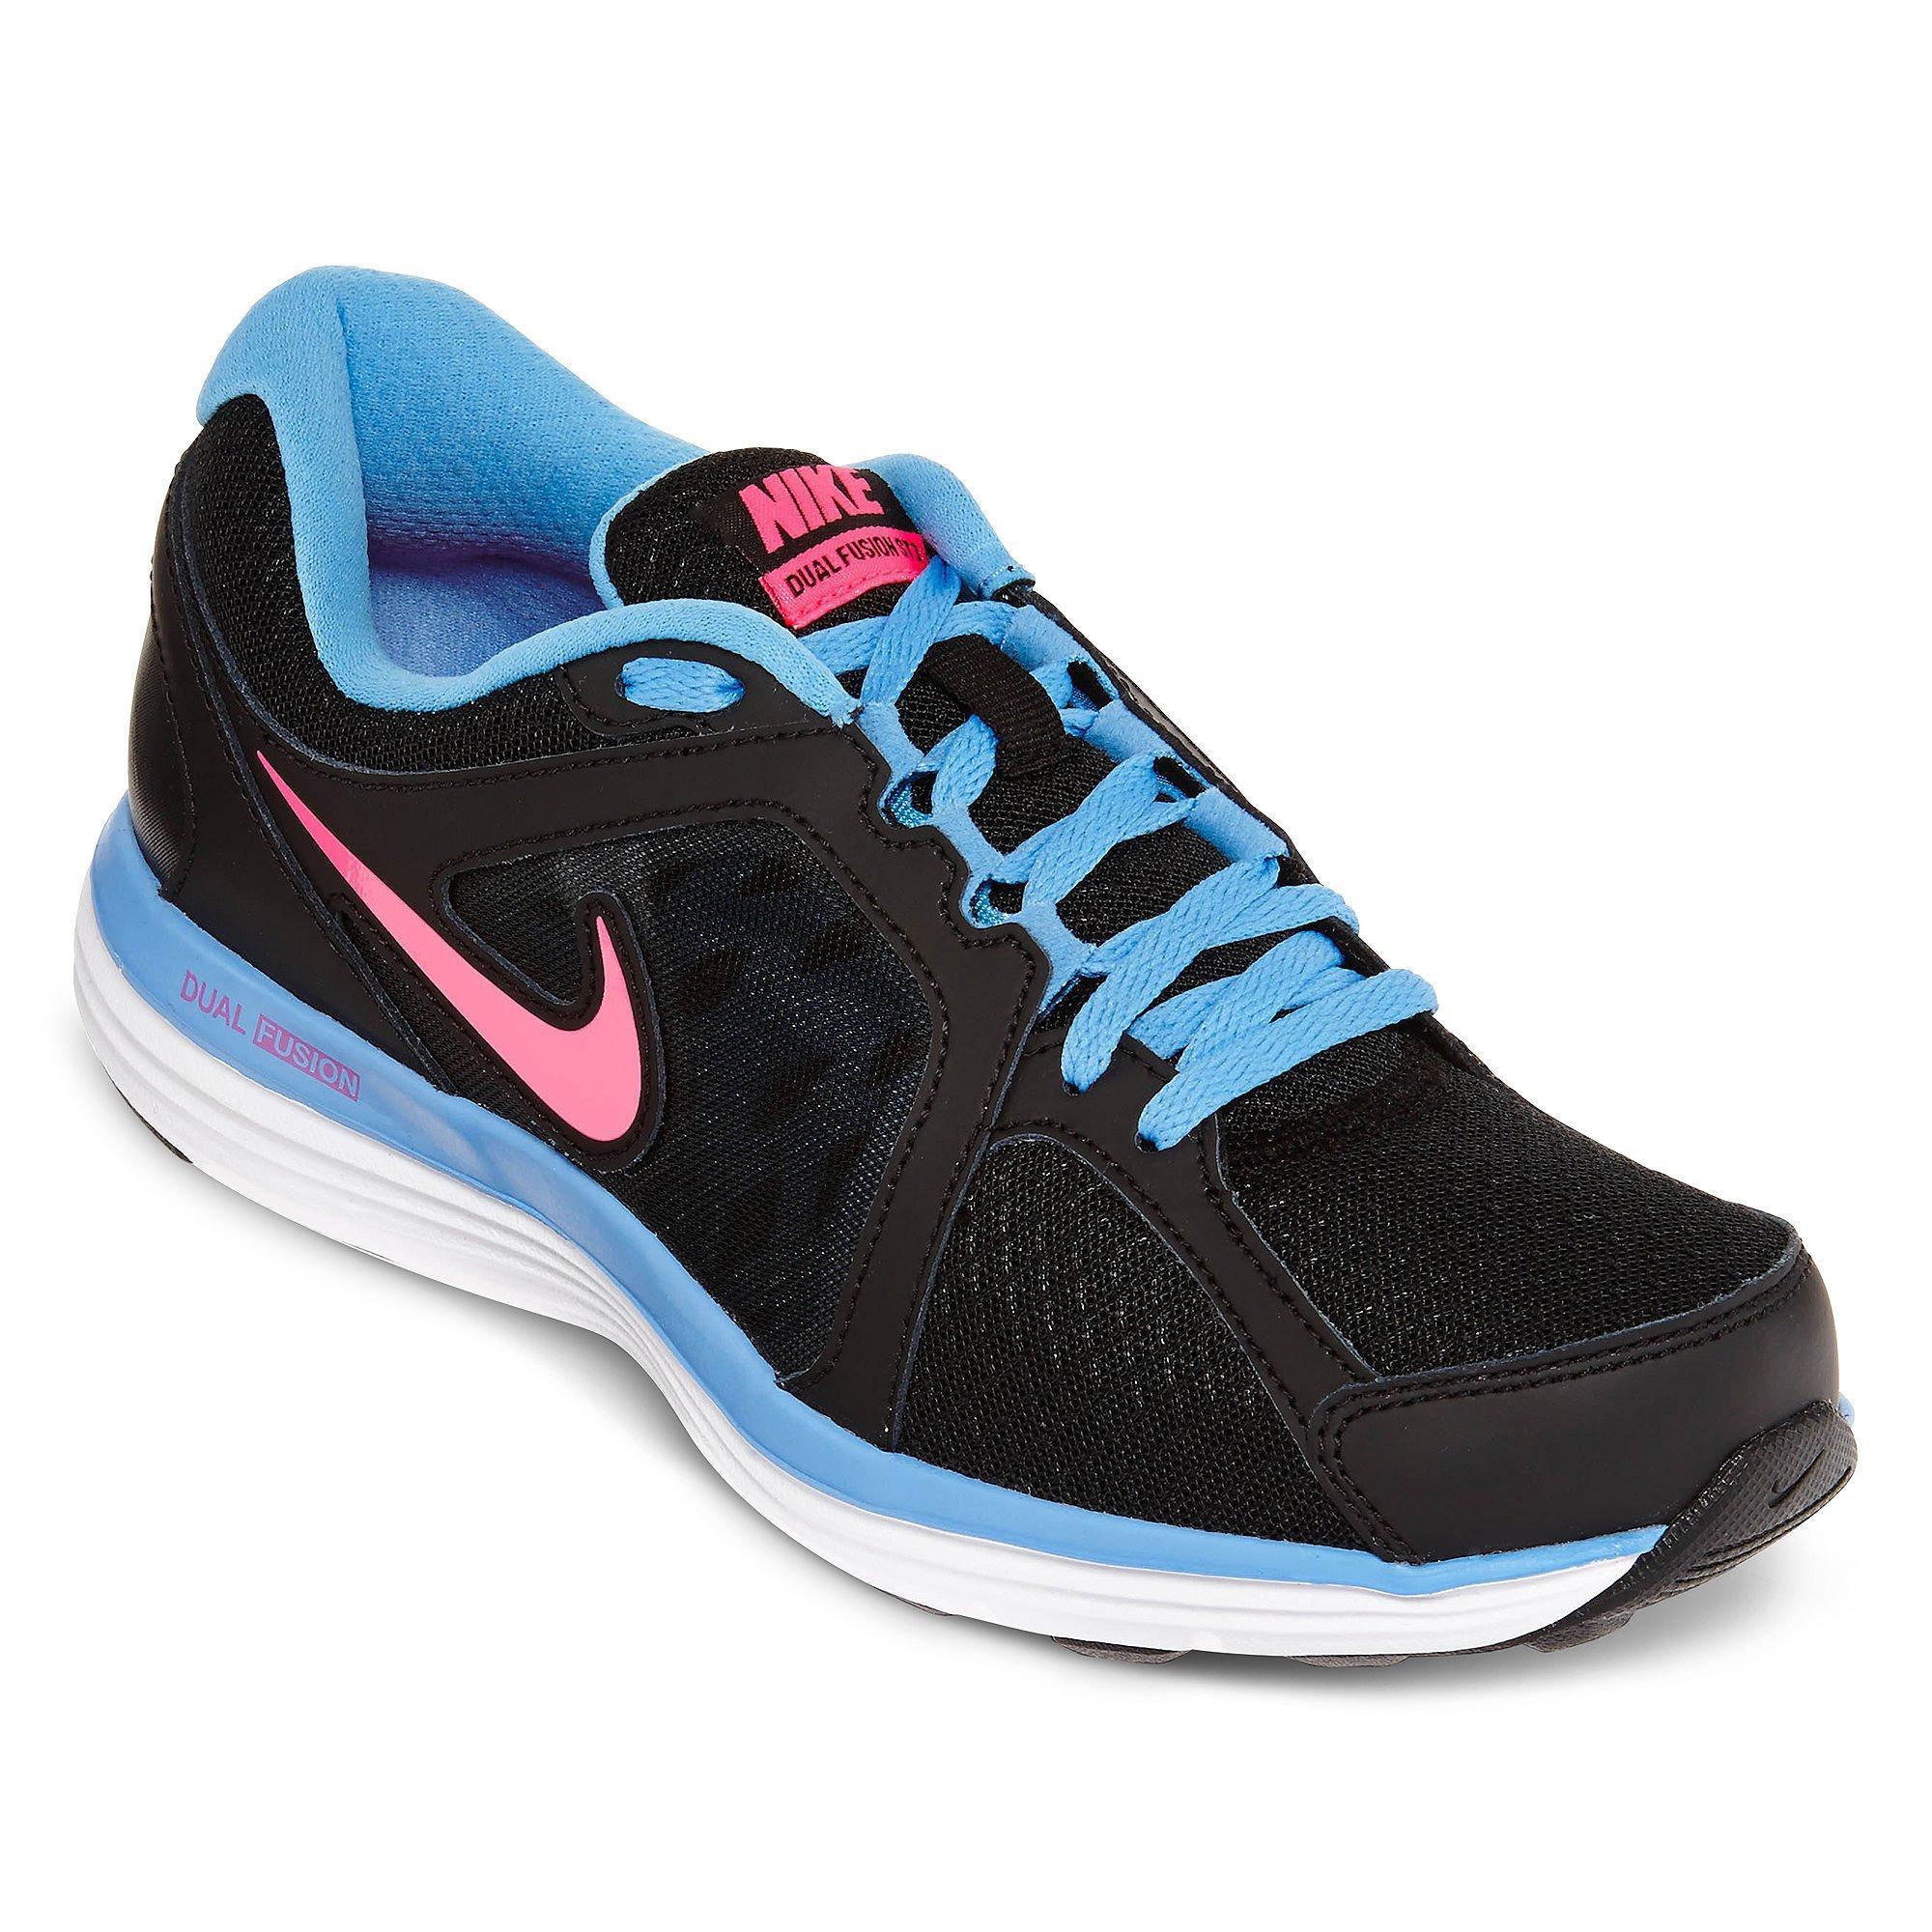 Clarins Womens Nike Dual Fusion ST 3 Trail Runner Shoes B...